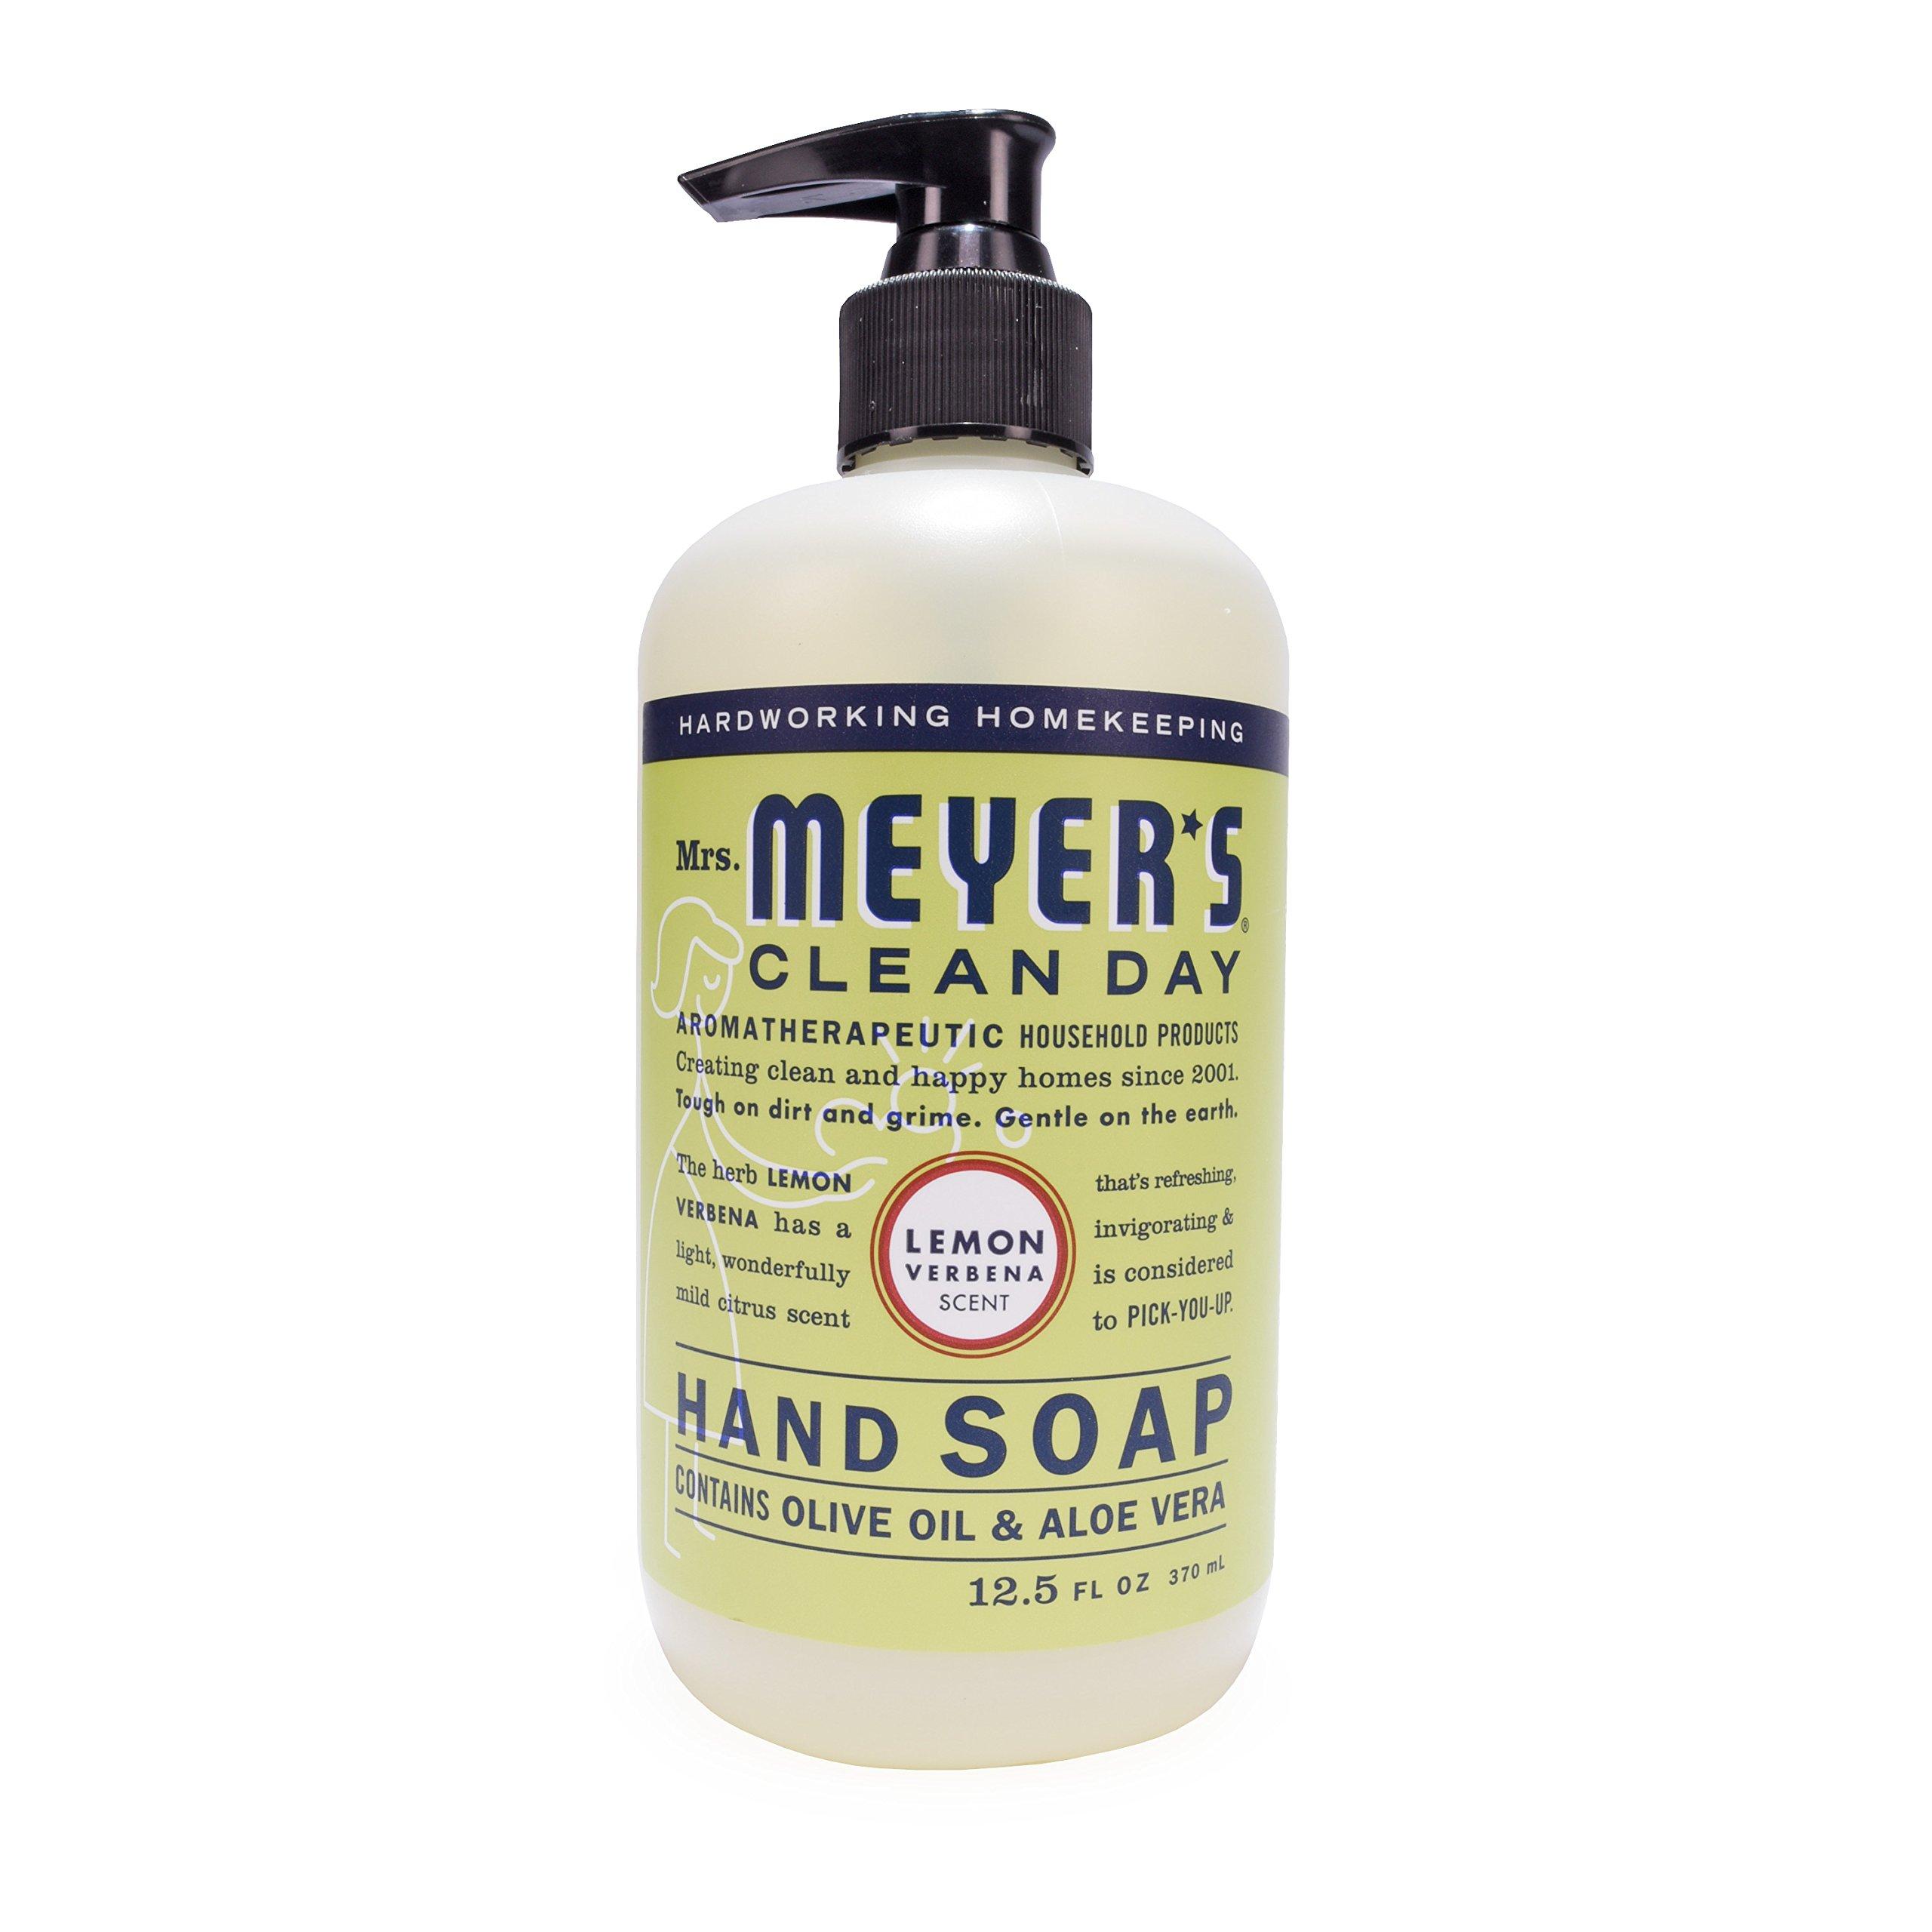 Mrs. Meyer´s Clean Day Hand Soap, Lemon Verbena, 12.5 fl oz, 3 ct by Mrs. Meyer's Clean Day (Image #5)